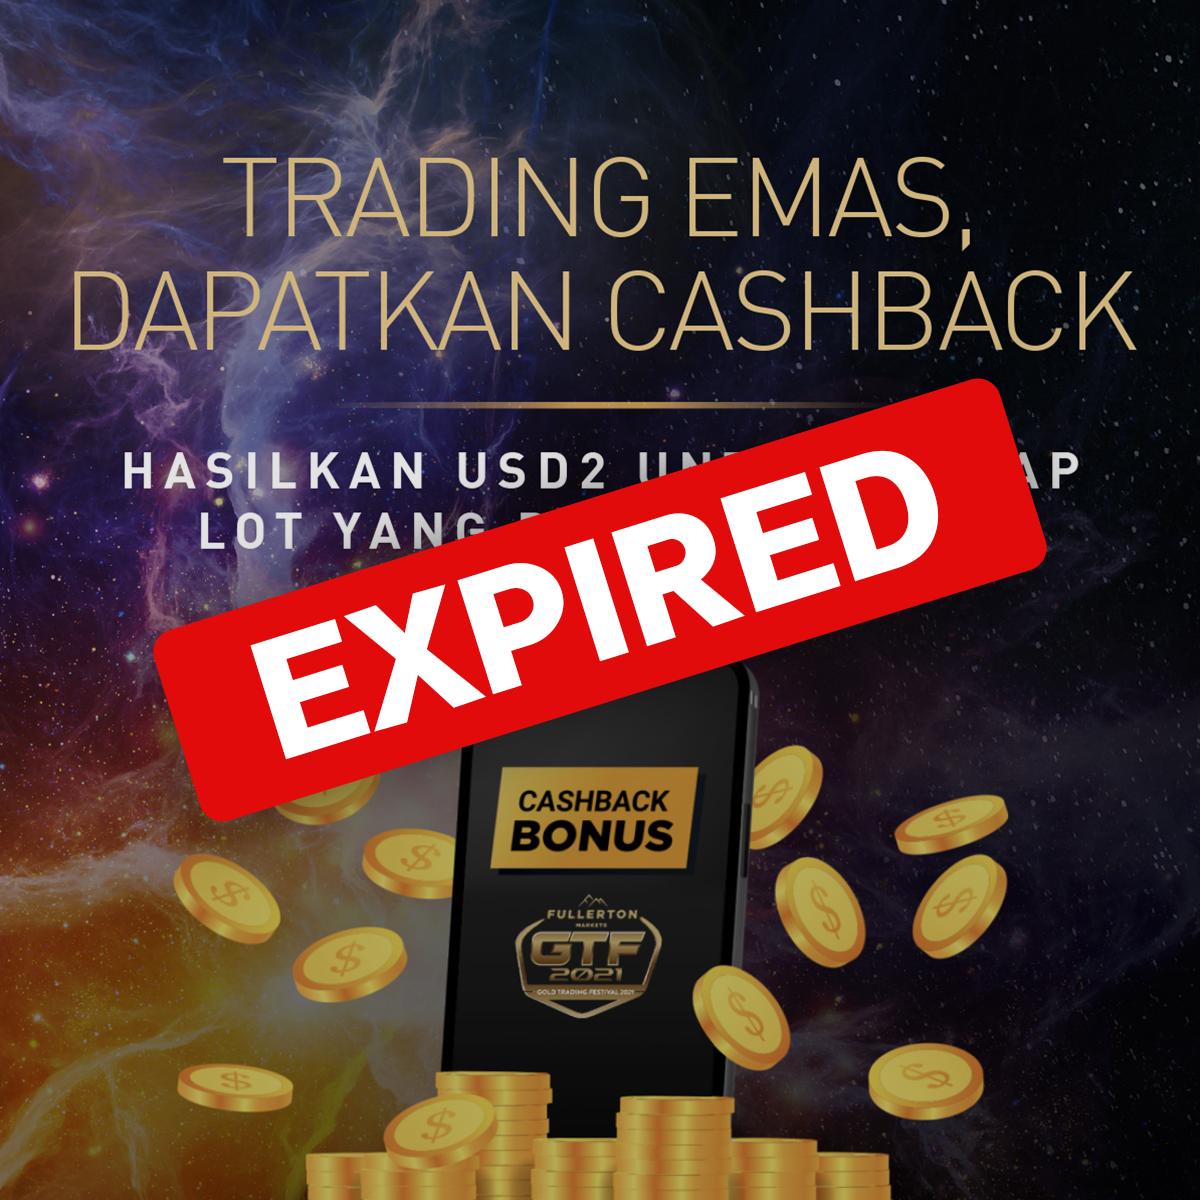 GTF---Banners-for-Cashback-Bonus_1200x1200px-MY